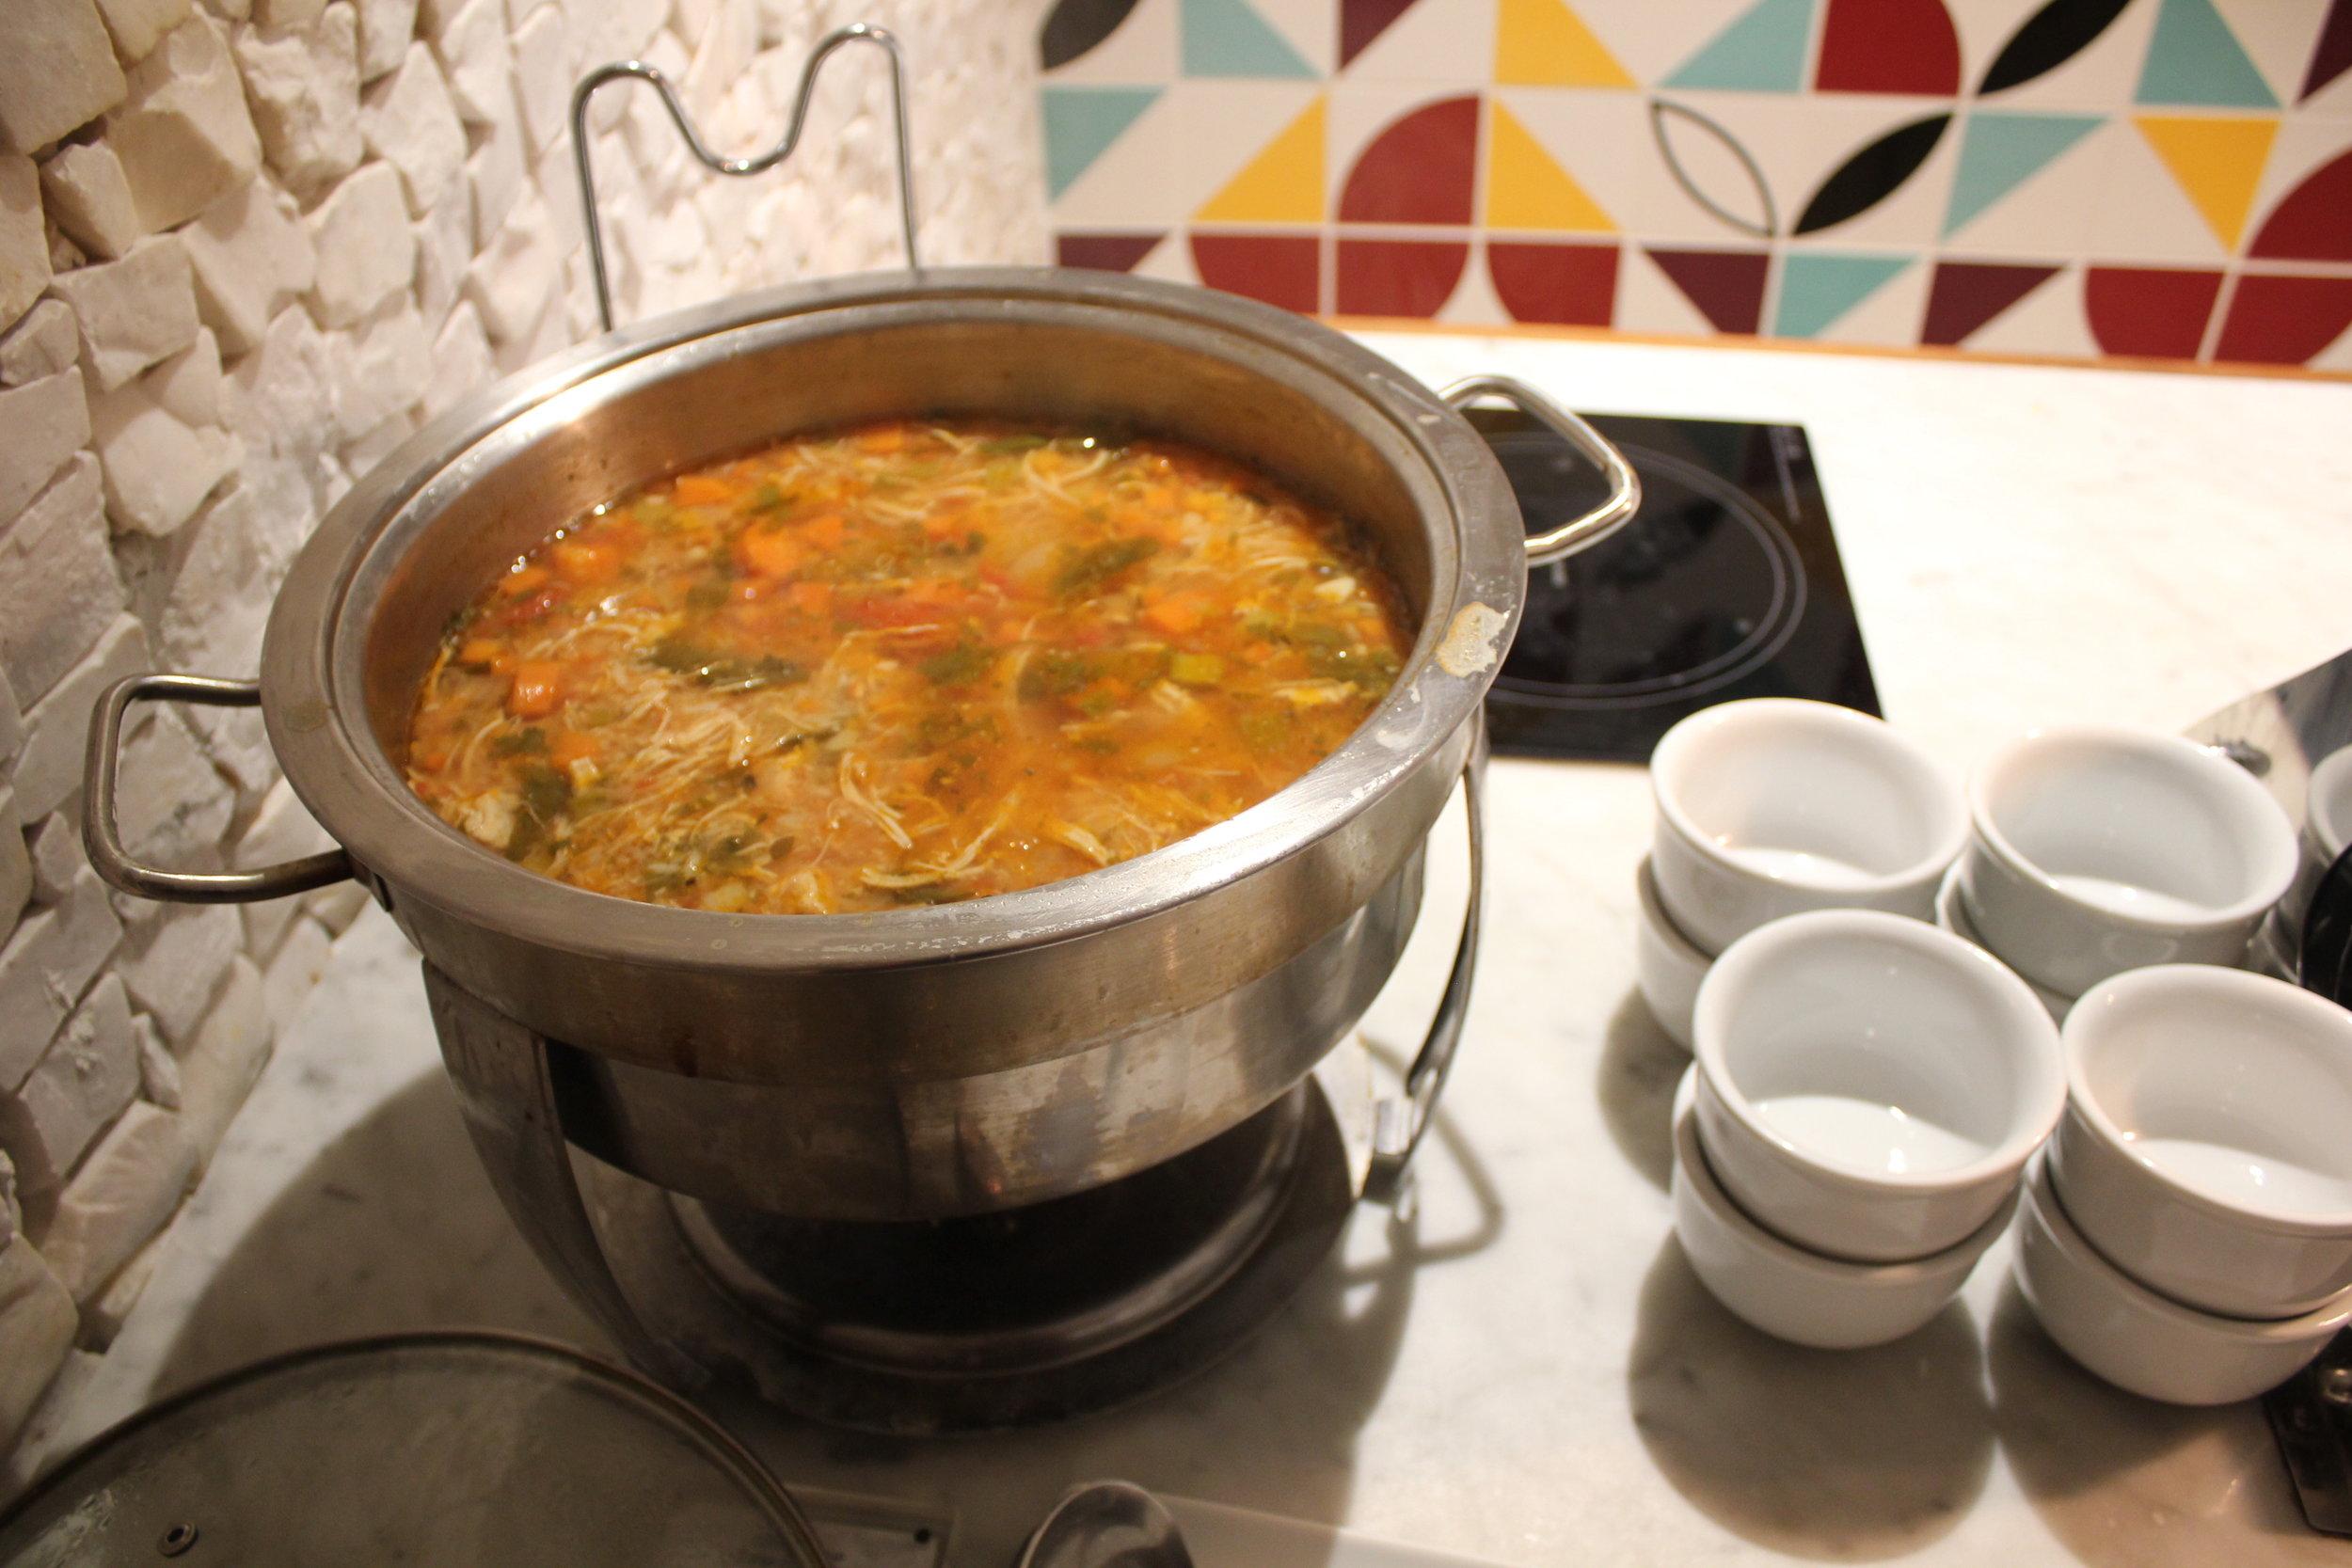 Star Alliance Lounge Rio de Janeiro – Soup